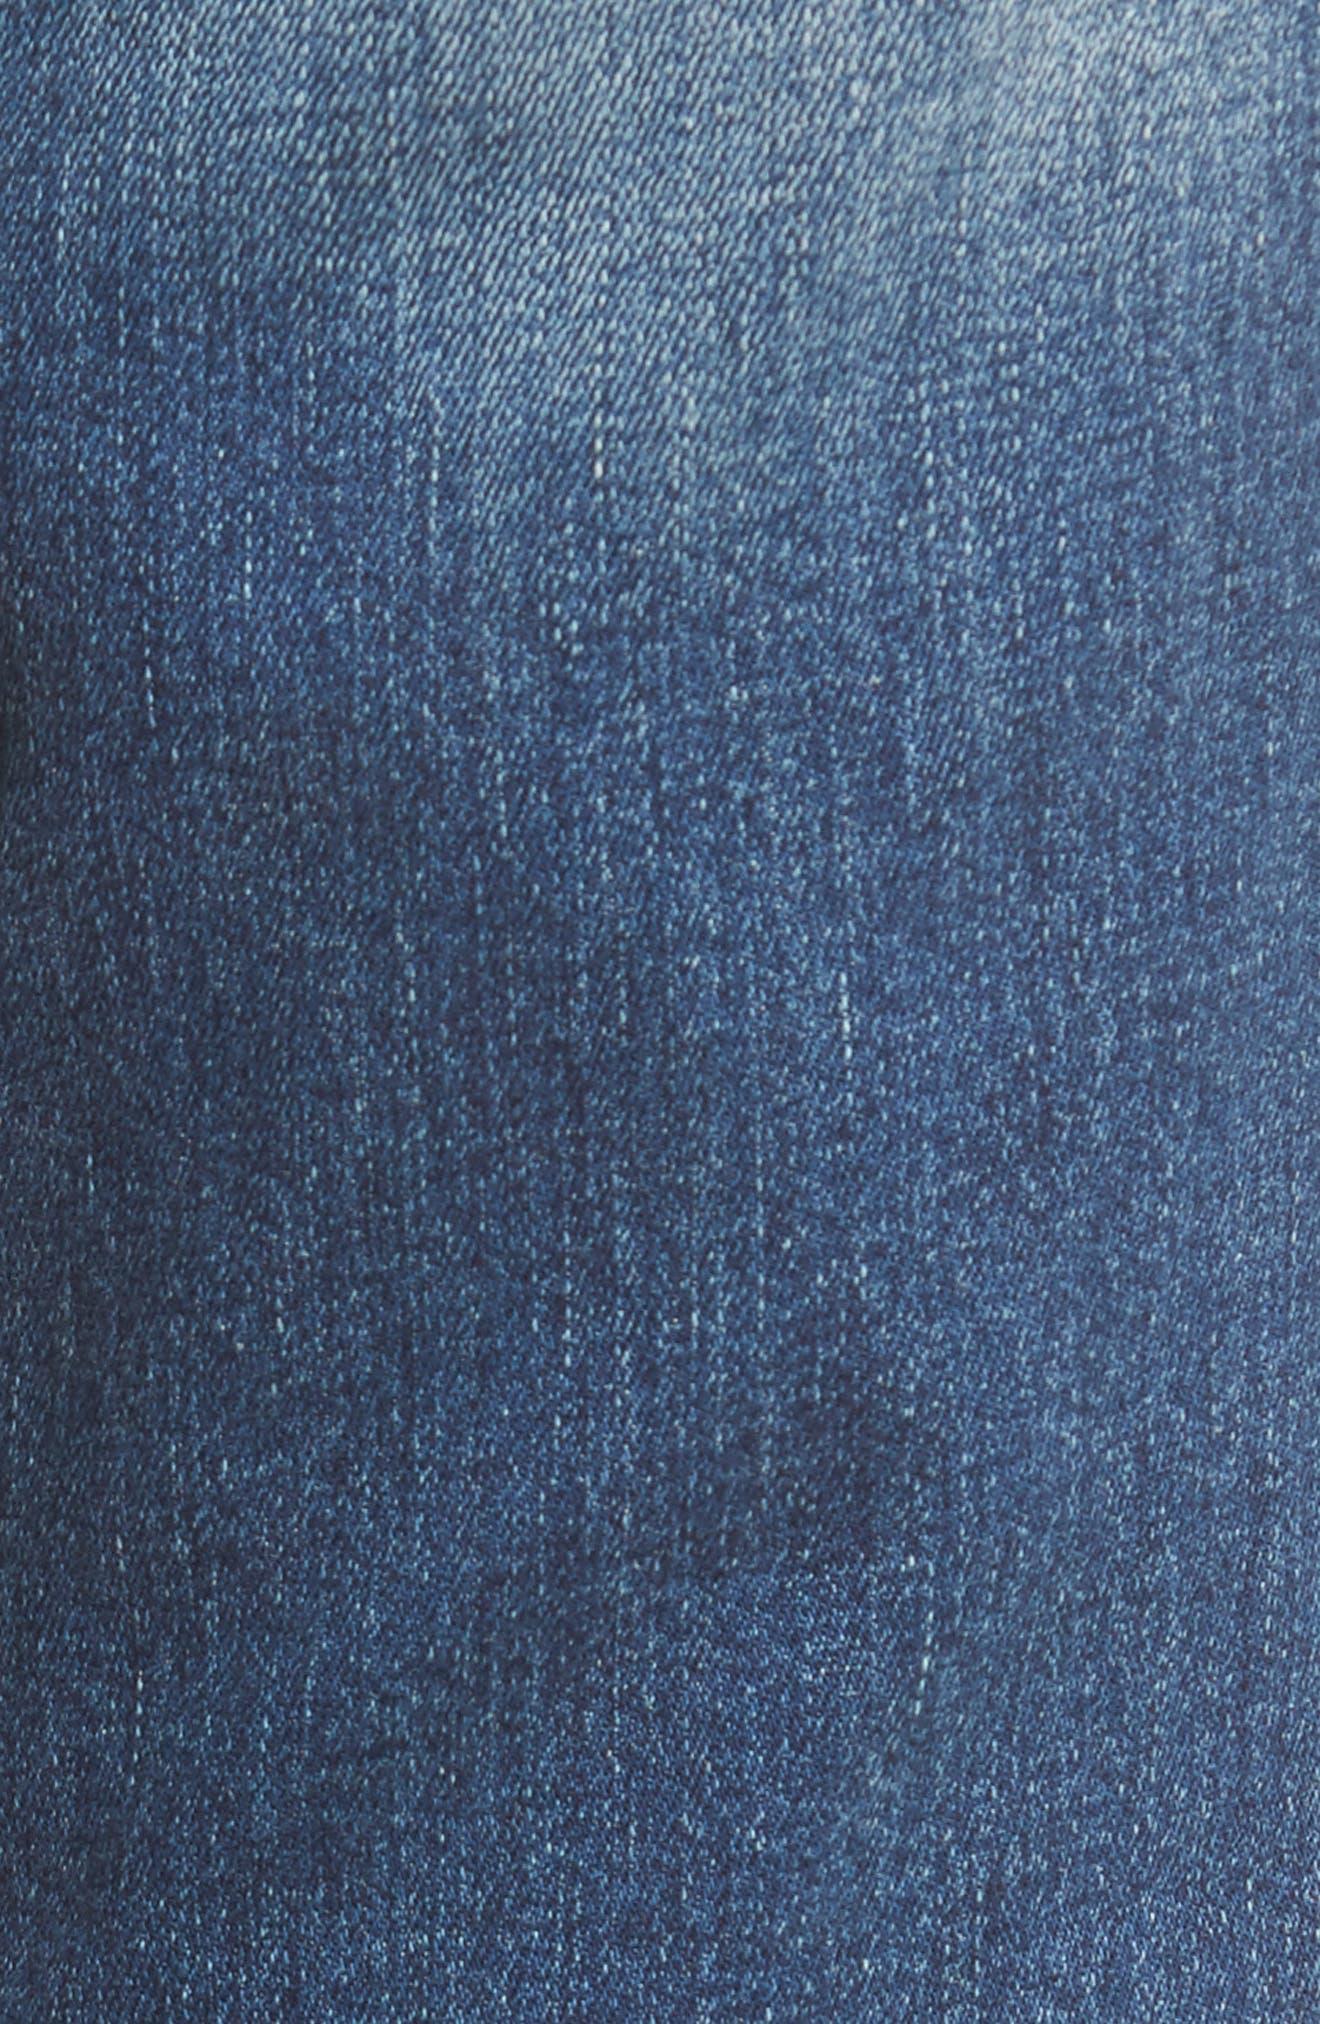 Distressed Fray Hem Skinny Jeans,                             Alternate thumbnail 2, color,                             Destroy